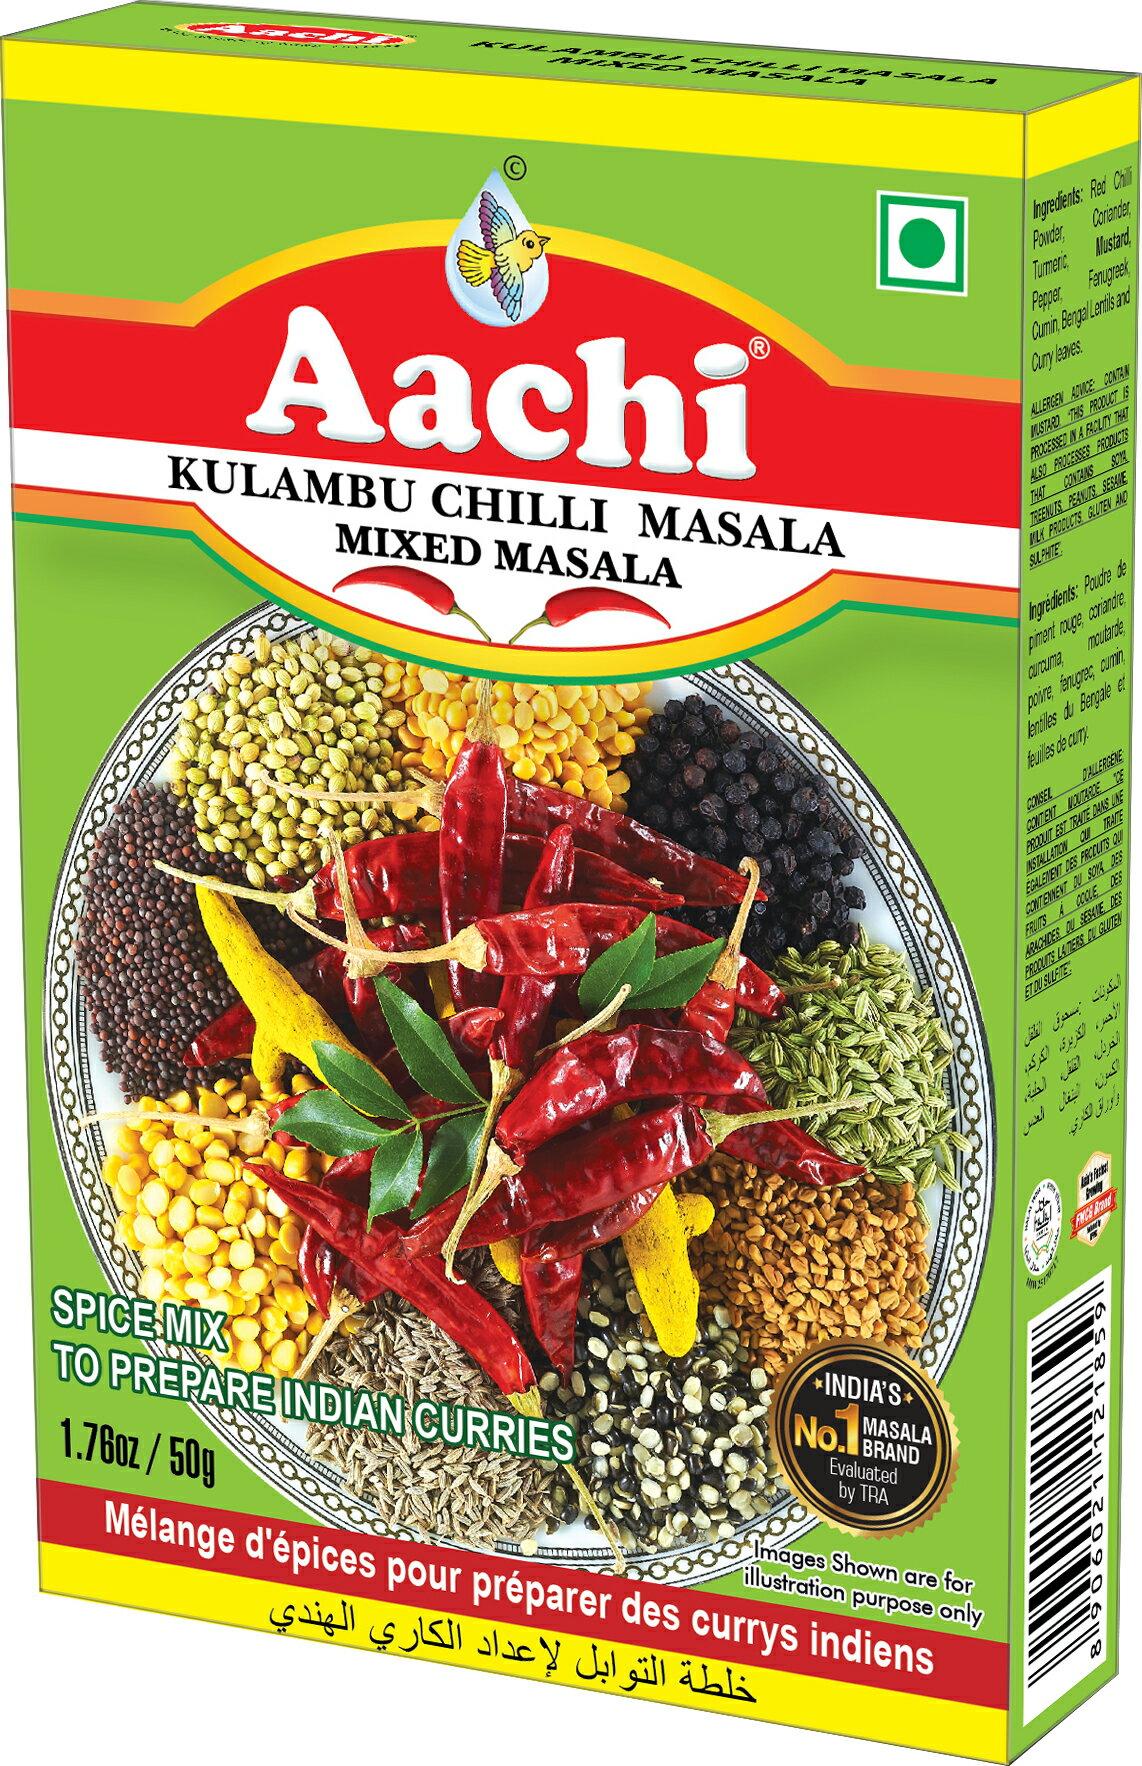 南印度通用咖哩粉  Kulambu Chilli Masala AACHI 50gm